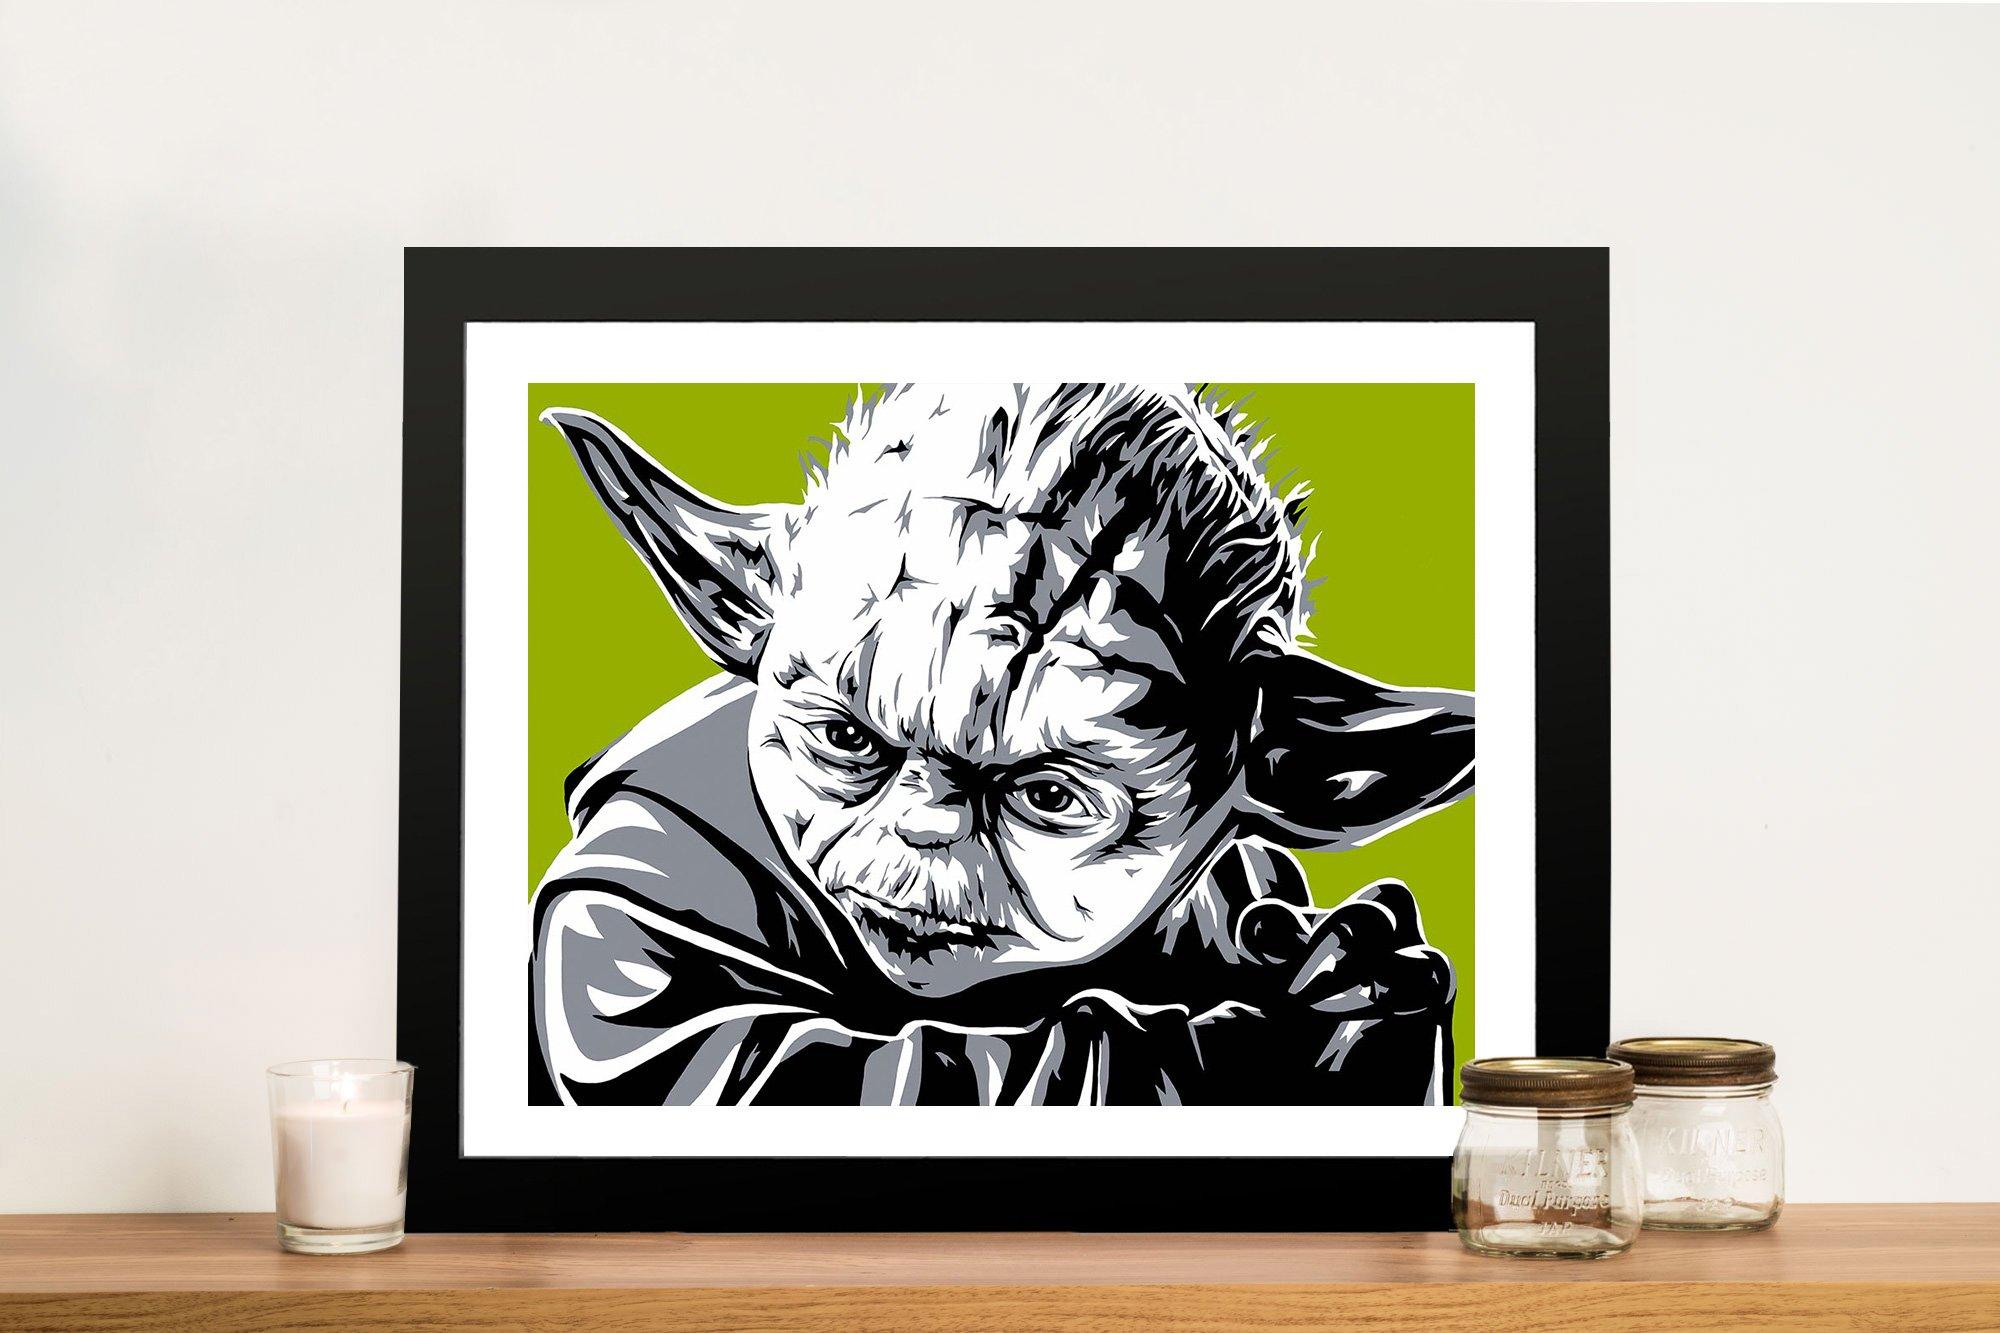 Yoda Framed Pop Art Print on Canvas